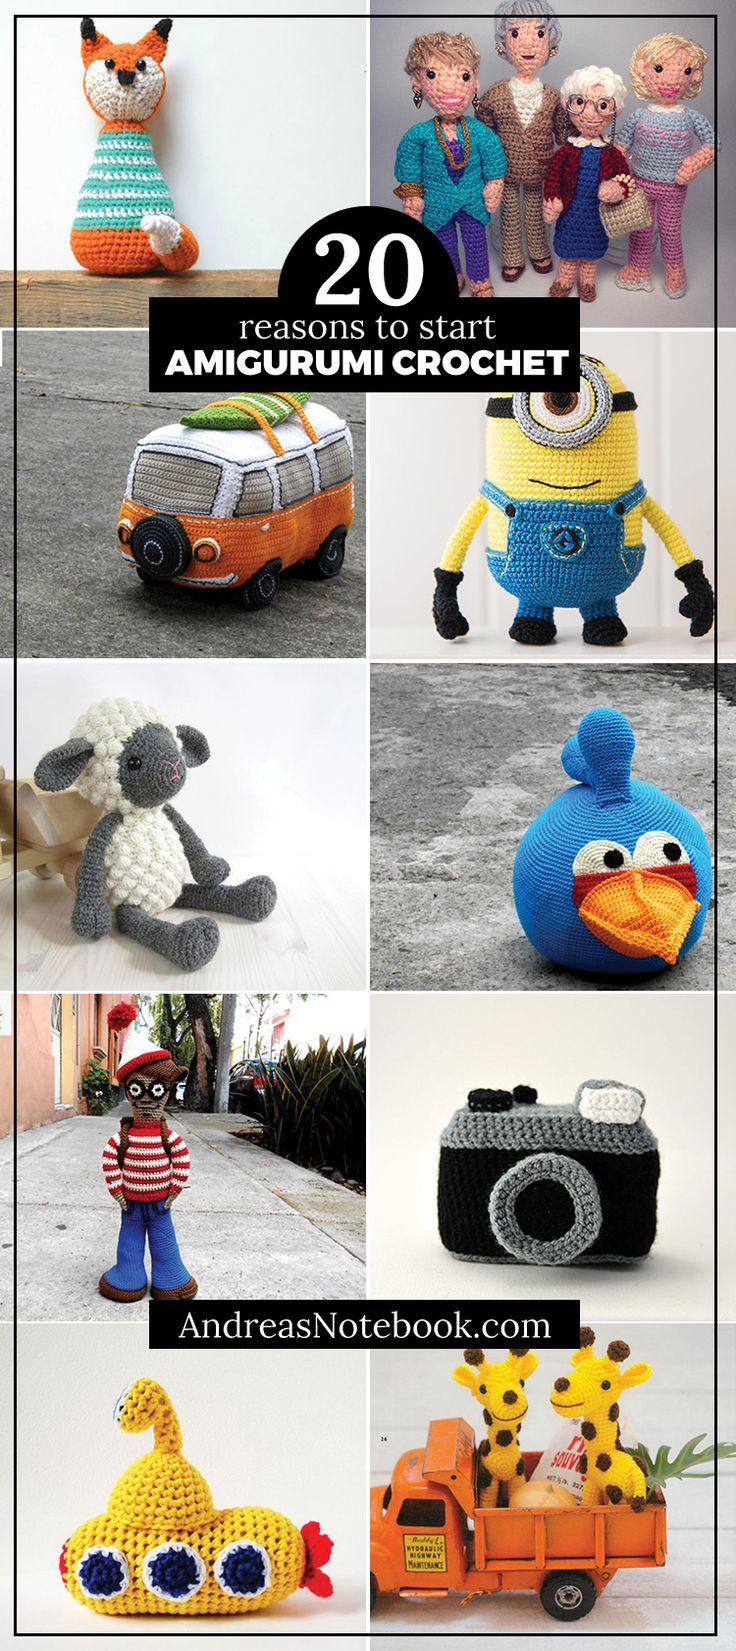 20+amigurumi+crochet+patterns+you'll+want